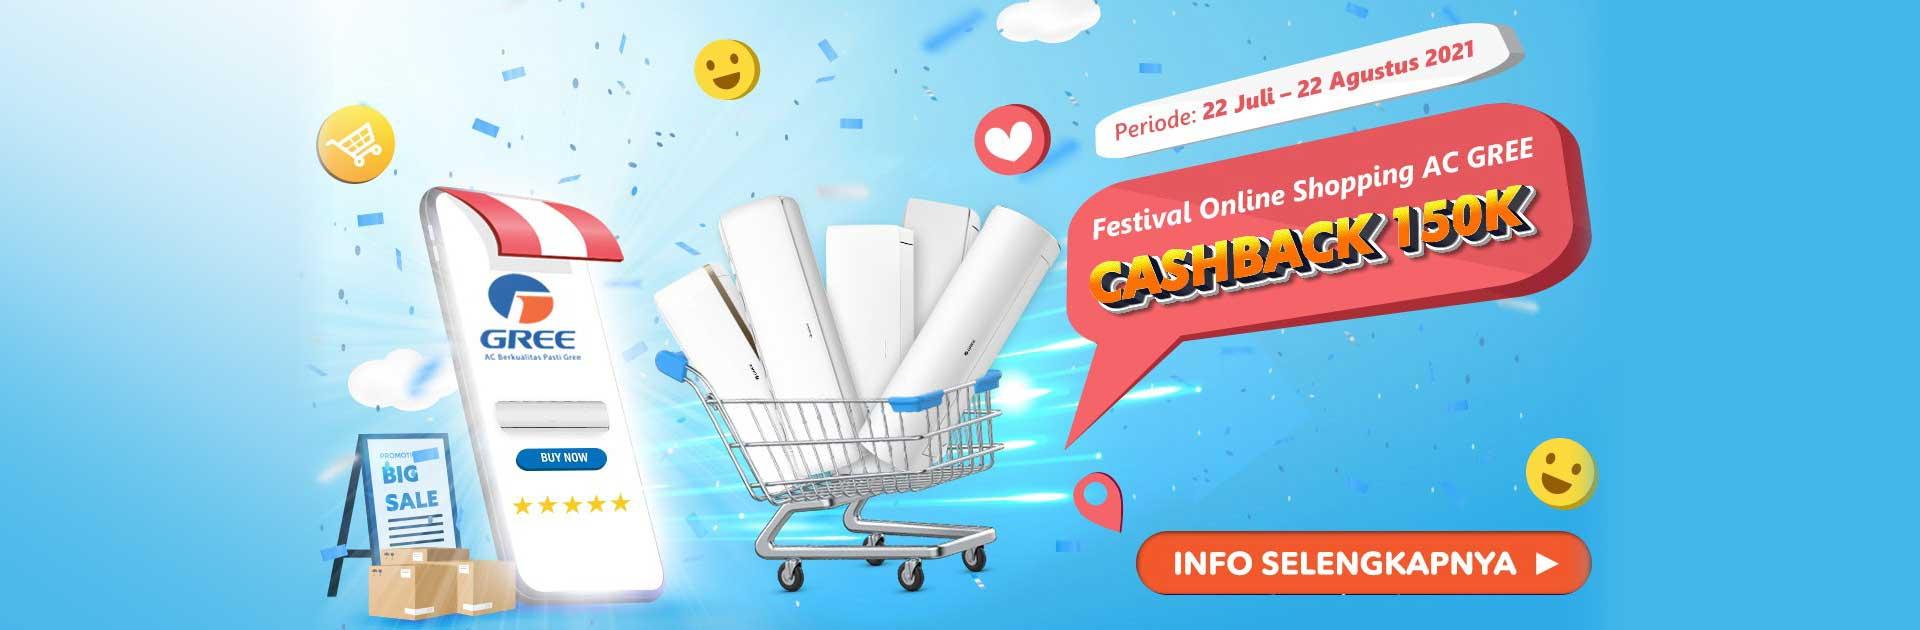 Festival Online Shopping AC Gree Kasih Review Dapat Cashback 150rb